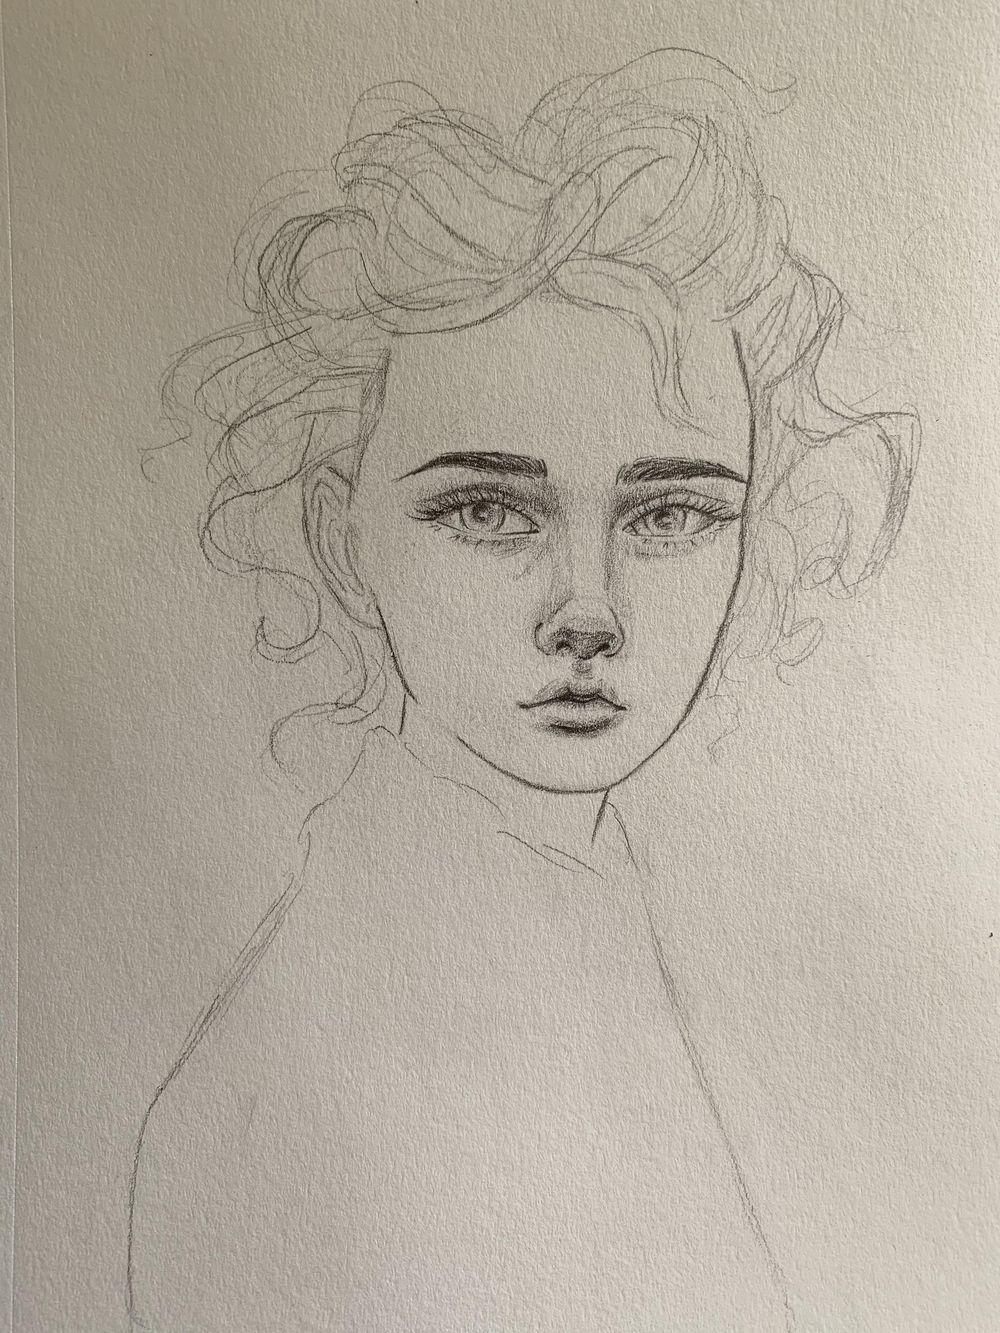 Portrait Mimicry Sketch - image 3 - student project